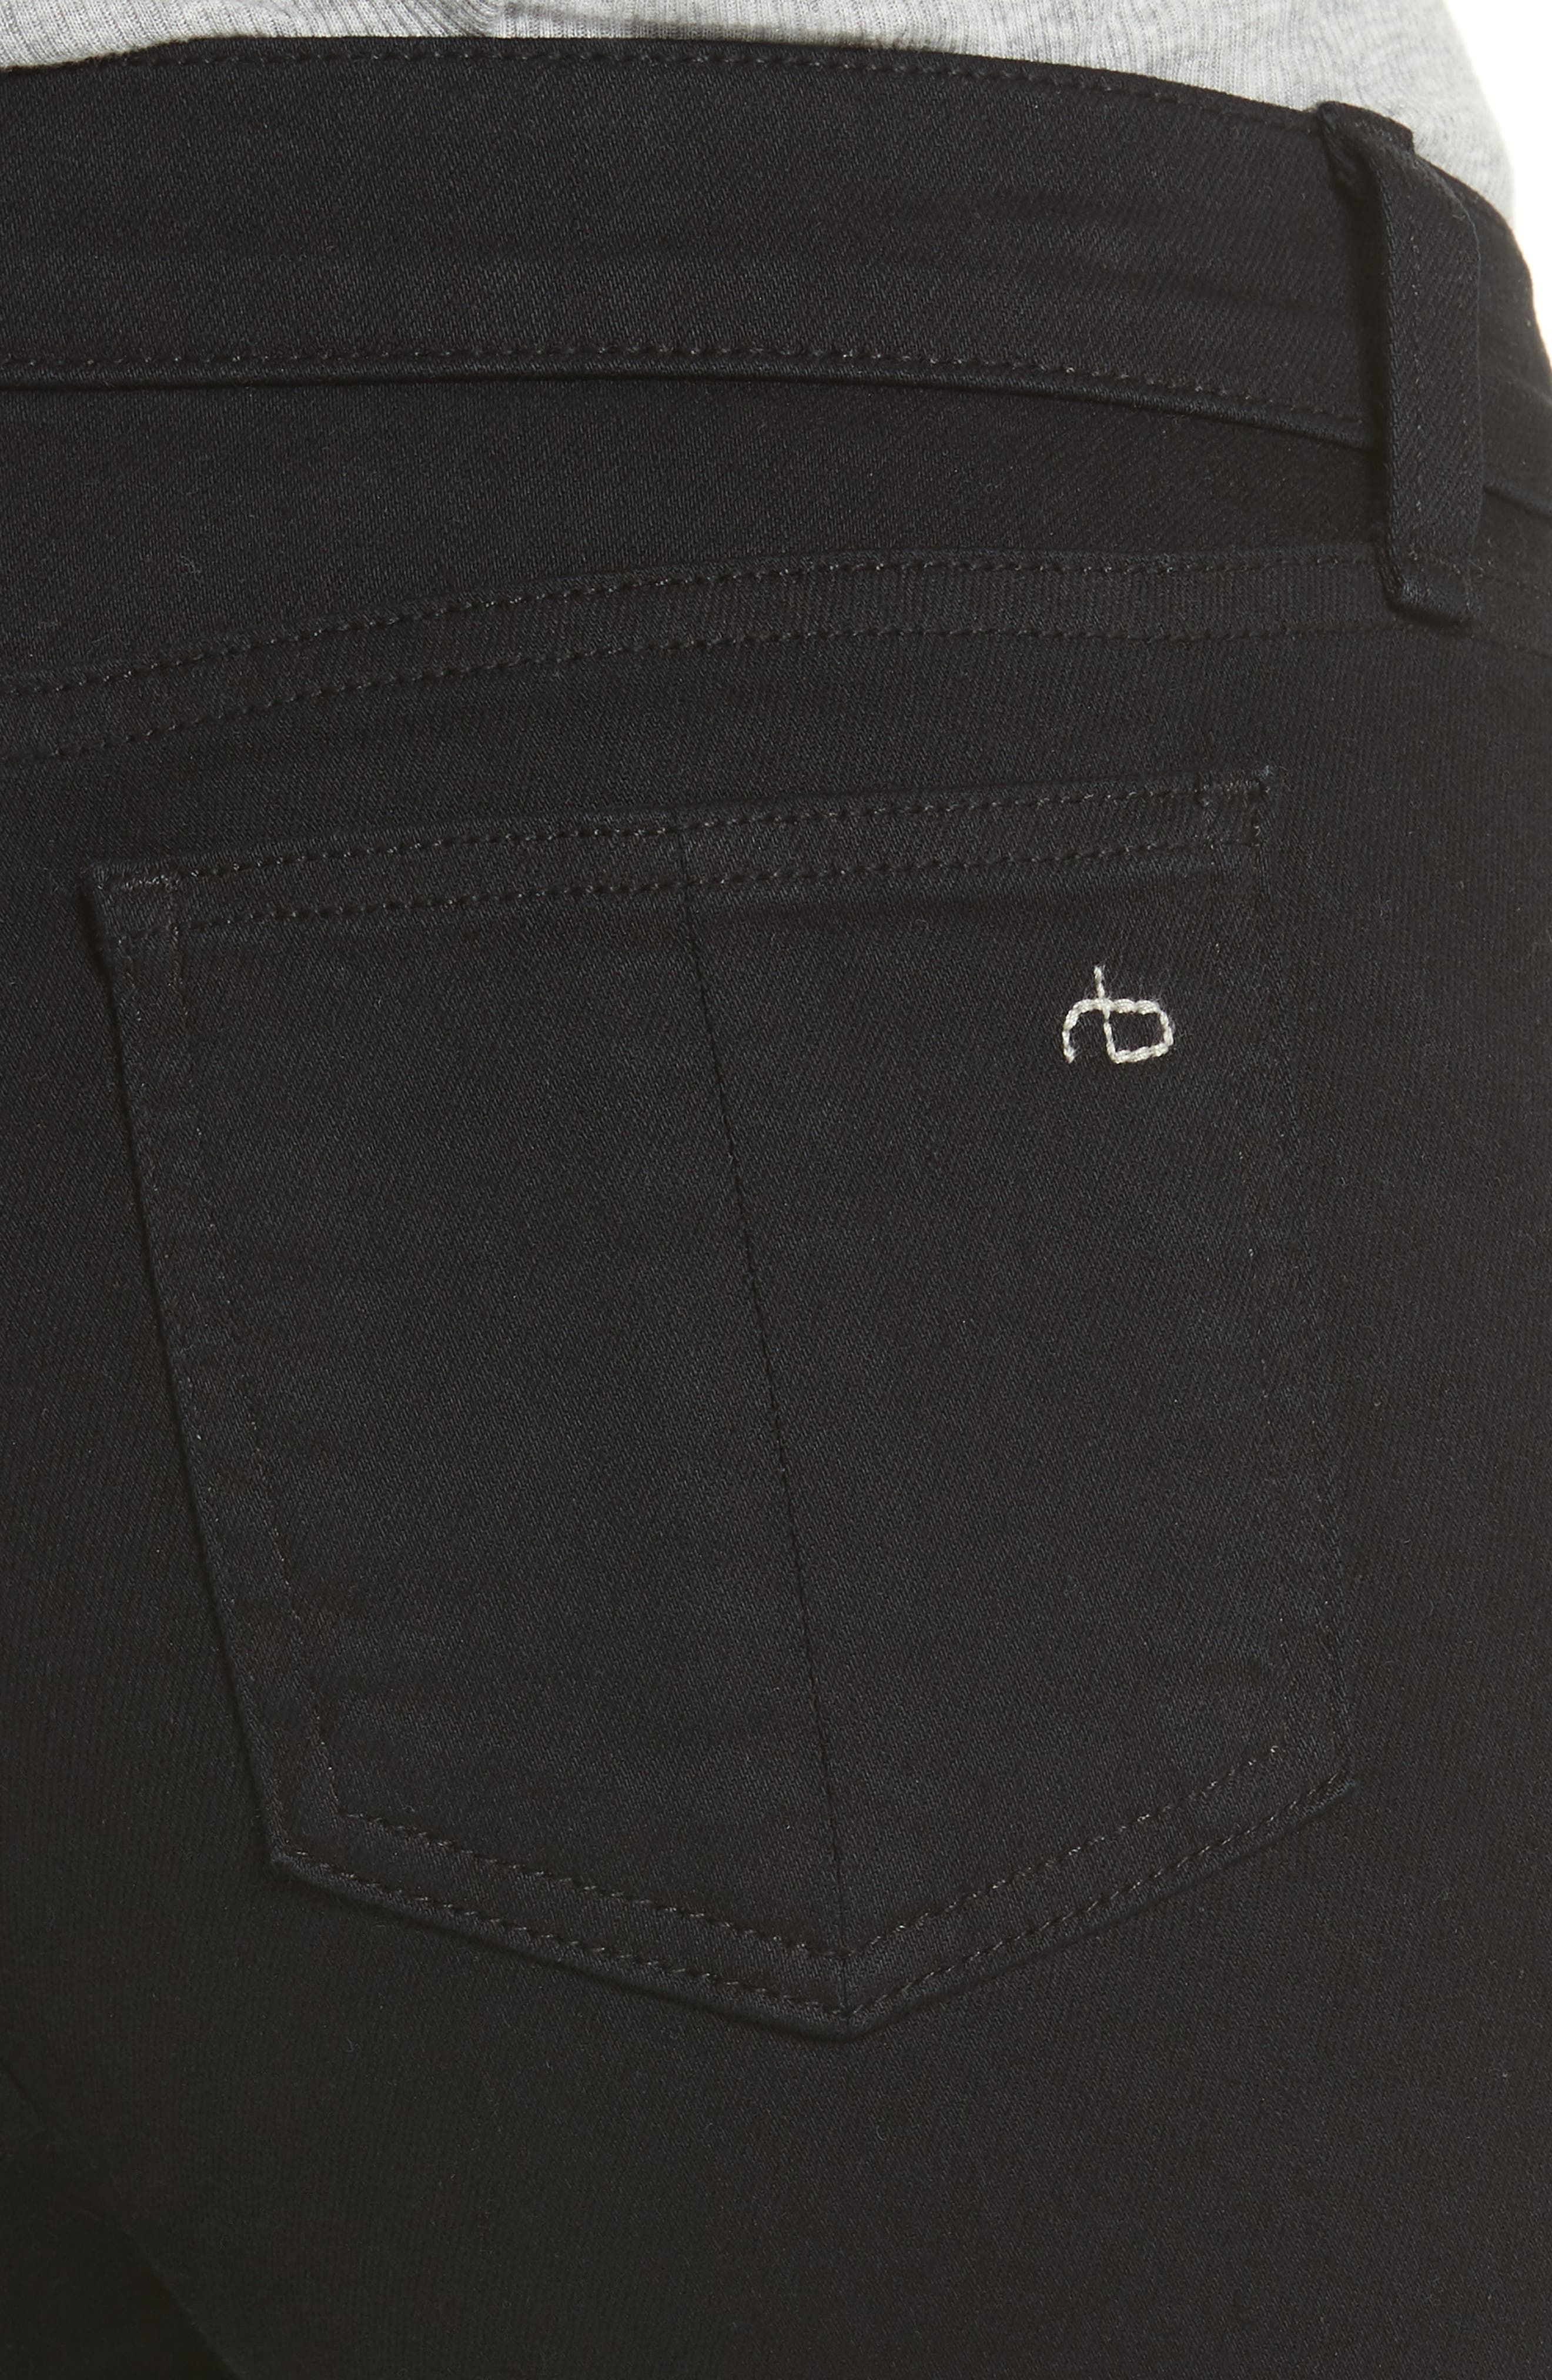 RAG & BONE, 'The Skinny' Stretch Jeans, Alternate thumbnail 6, color, COAL